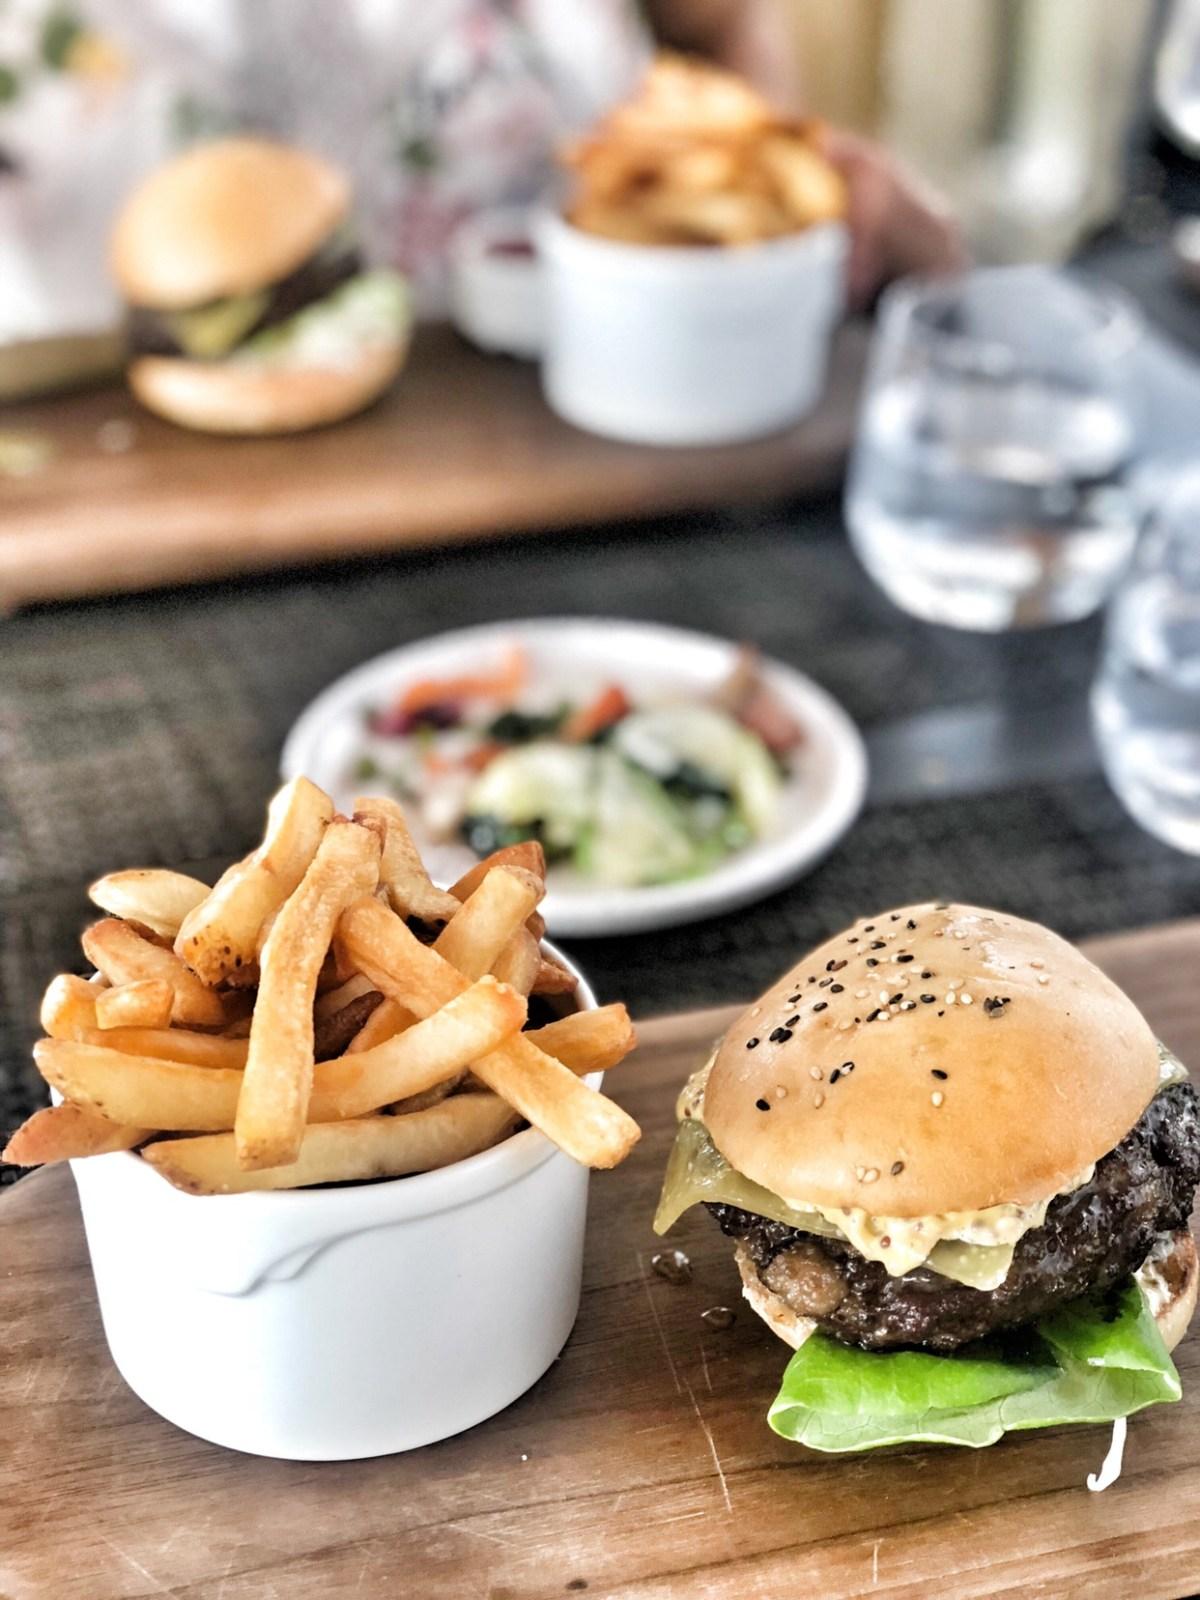 Mission Hill Burger